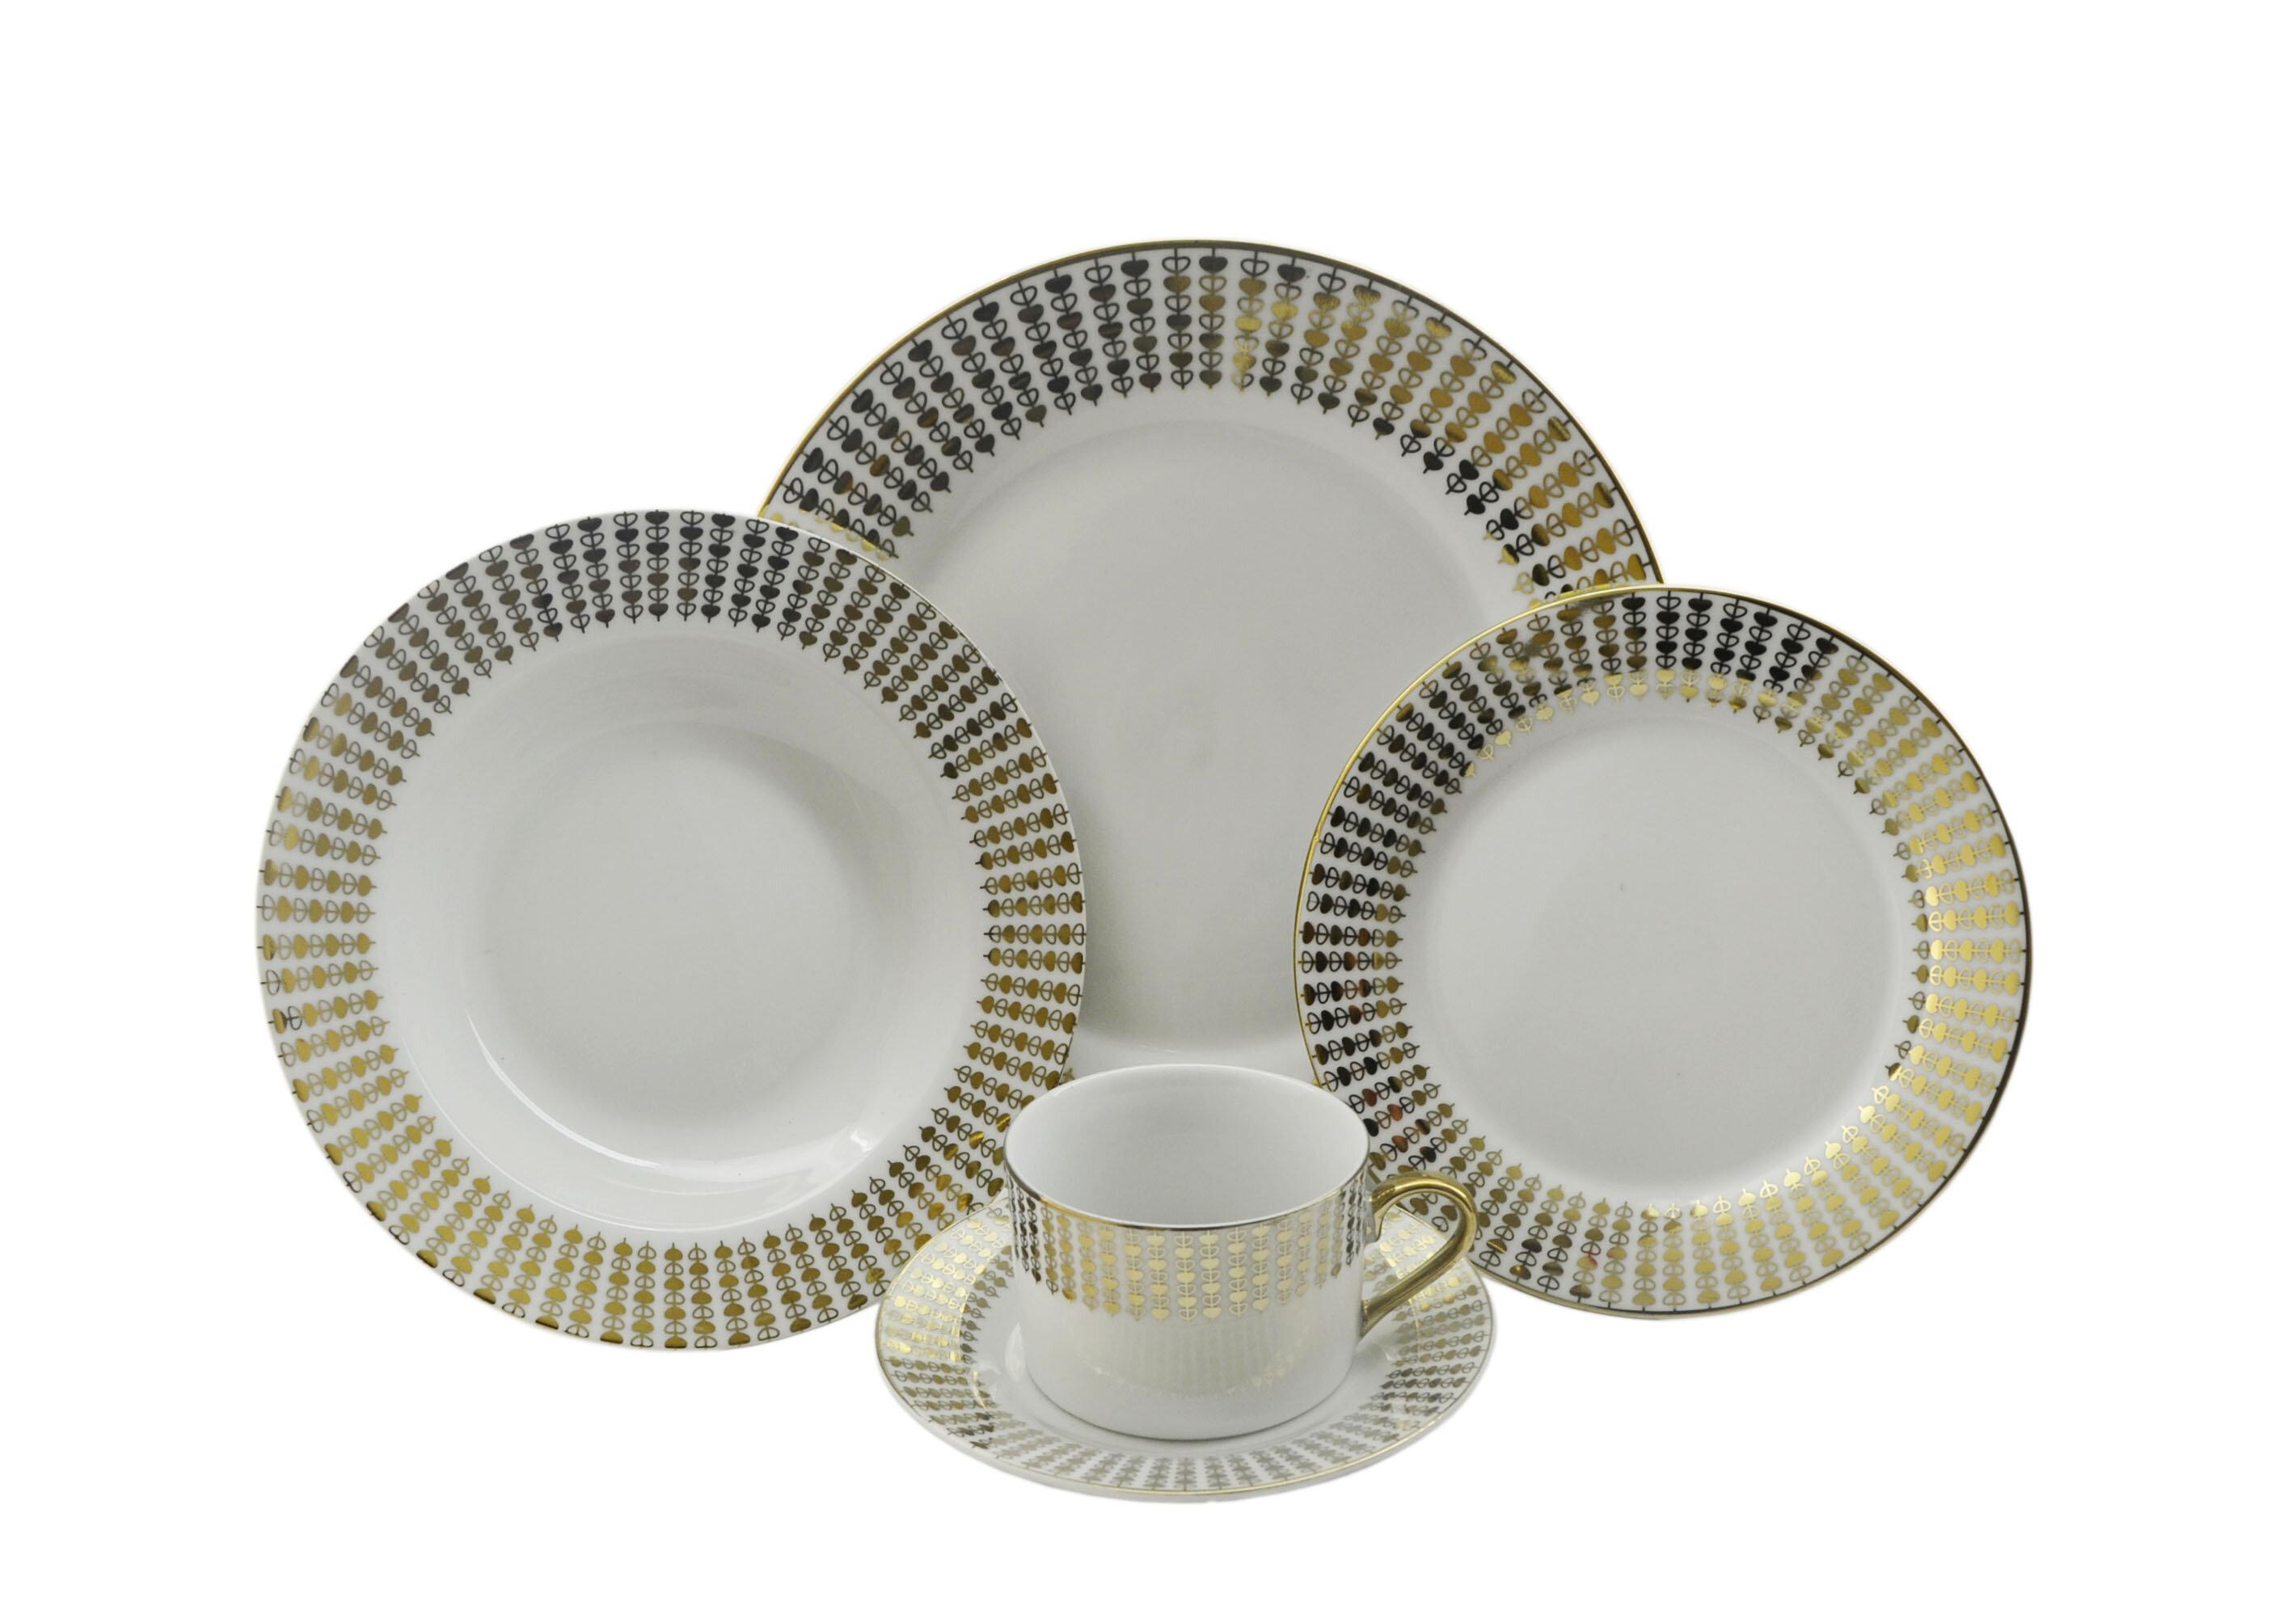 sc 1 st  Wayfair & Three Star Hearts 40 Piece Dinnerware Set Service for 8 | Wayfair